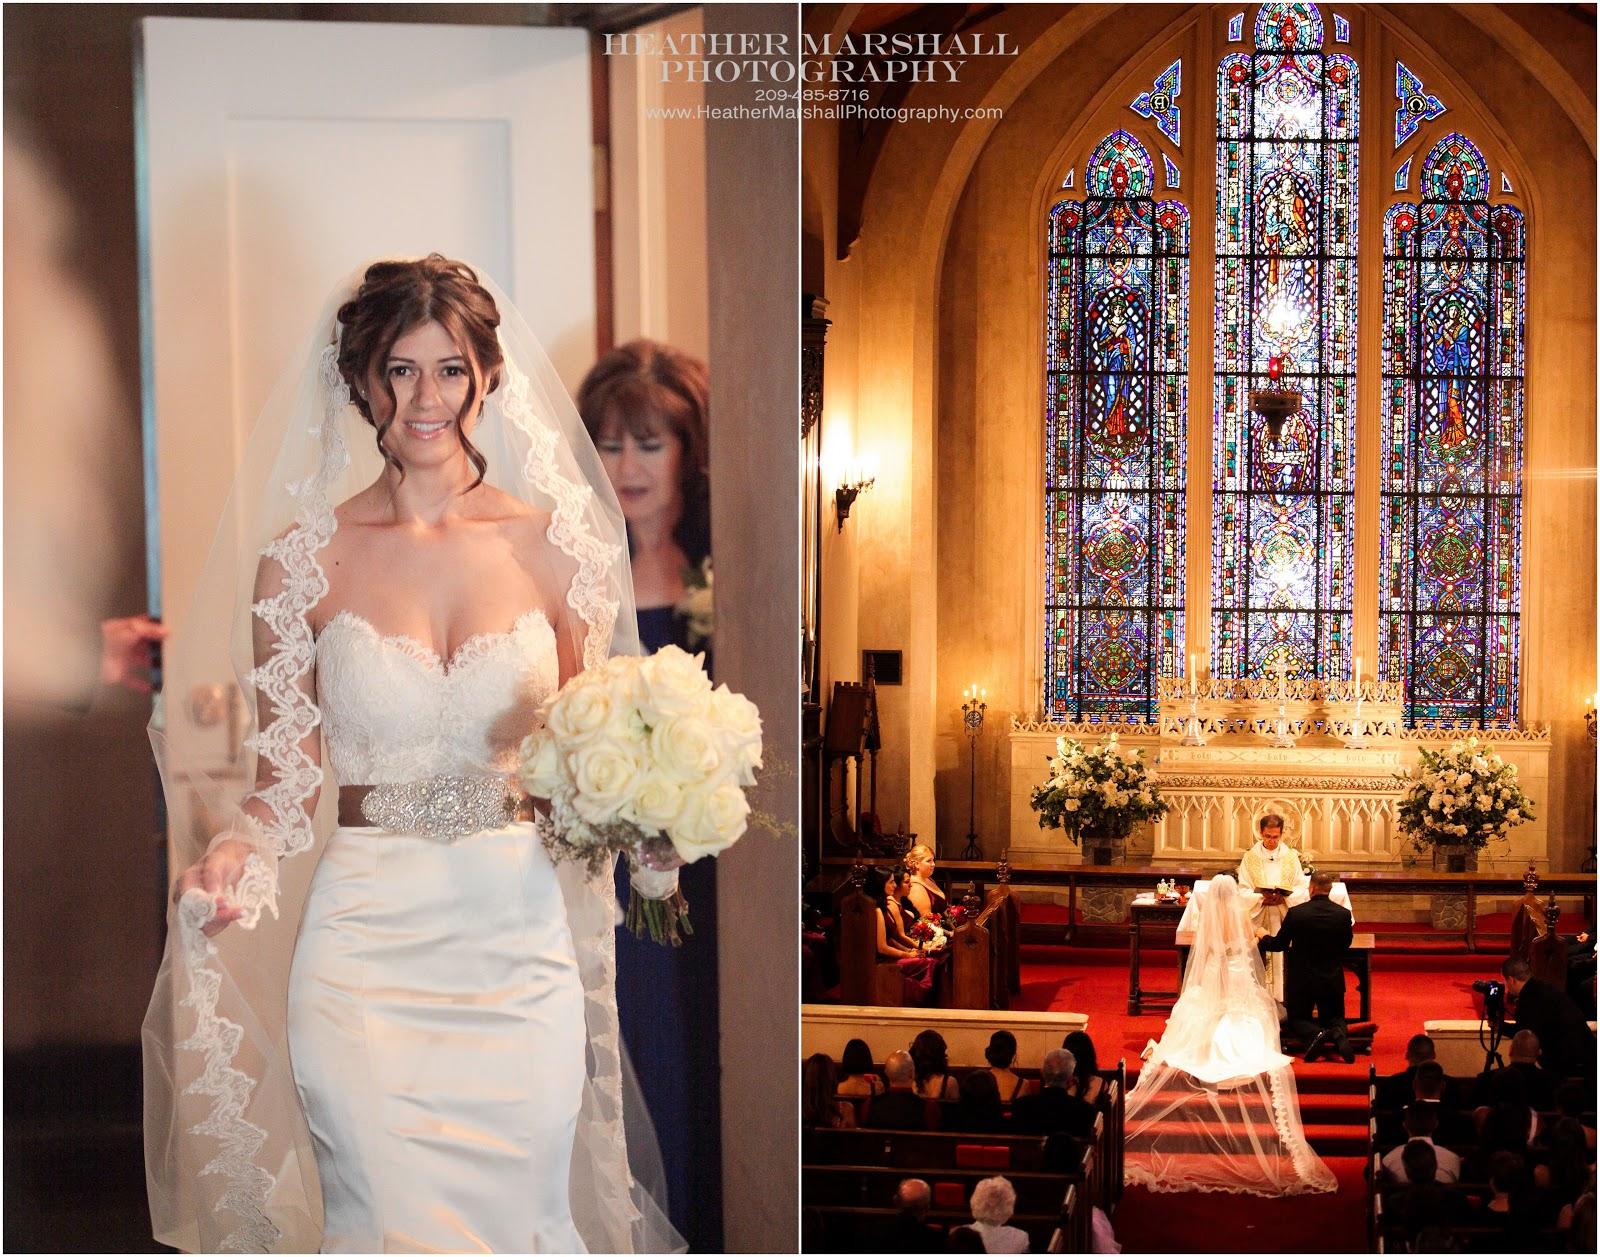 Heather Marshall Photography Richie Monica Say I Do Morris Chapel Stockton Ca Brookside Country Club Wedding